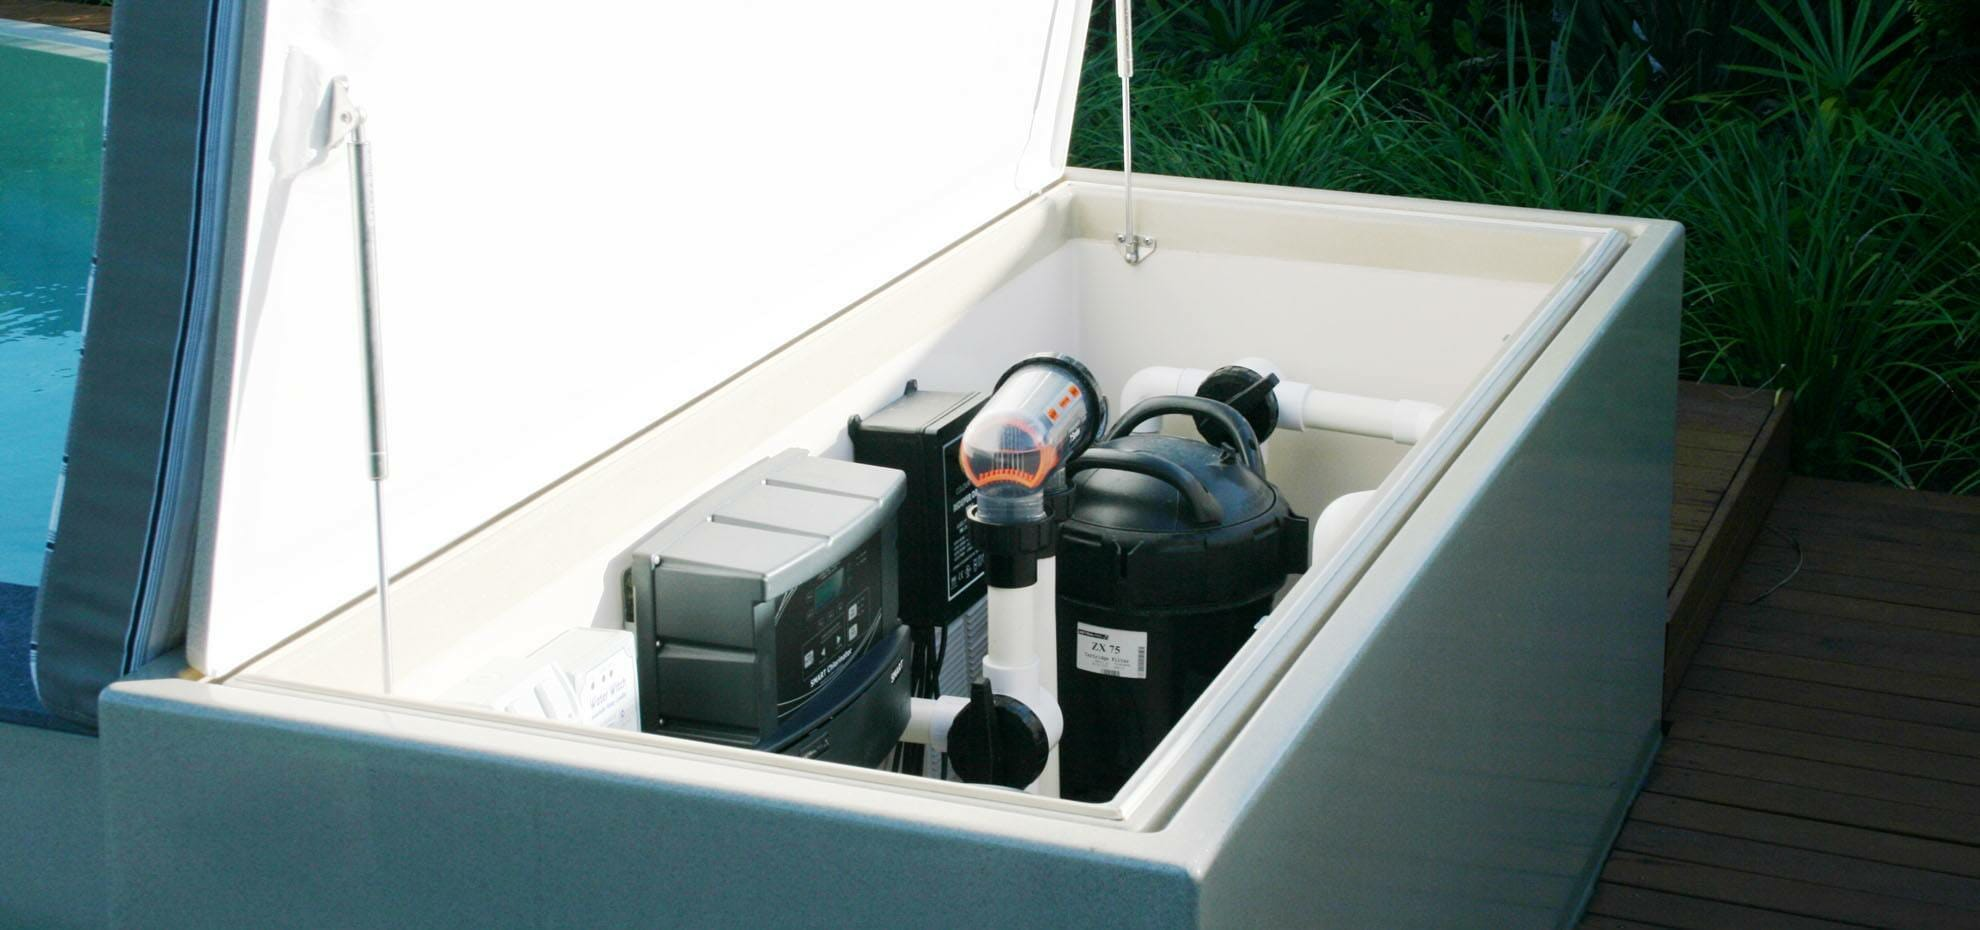 Fibreglass Pool pump by Leisure Pools